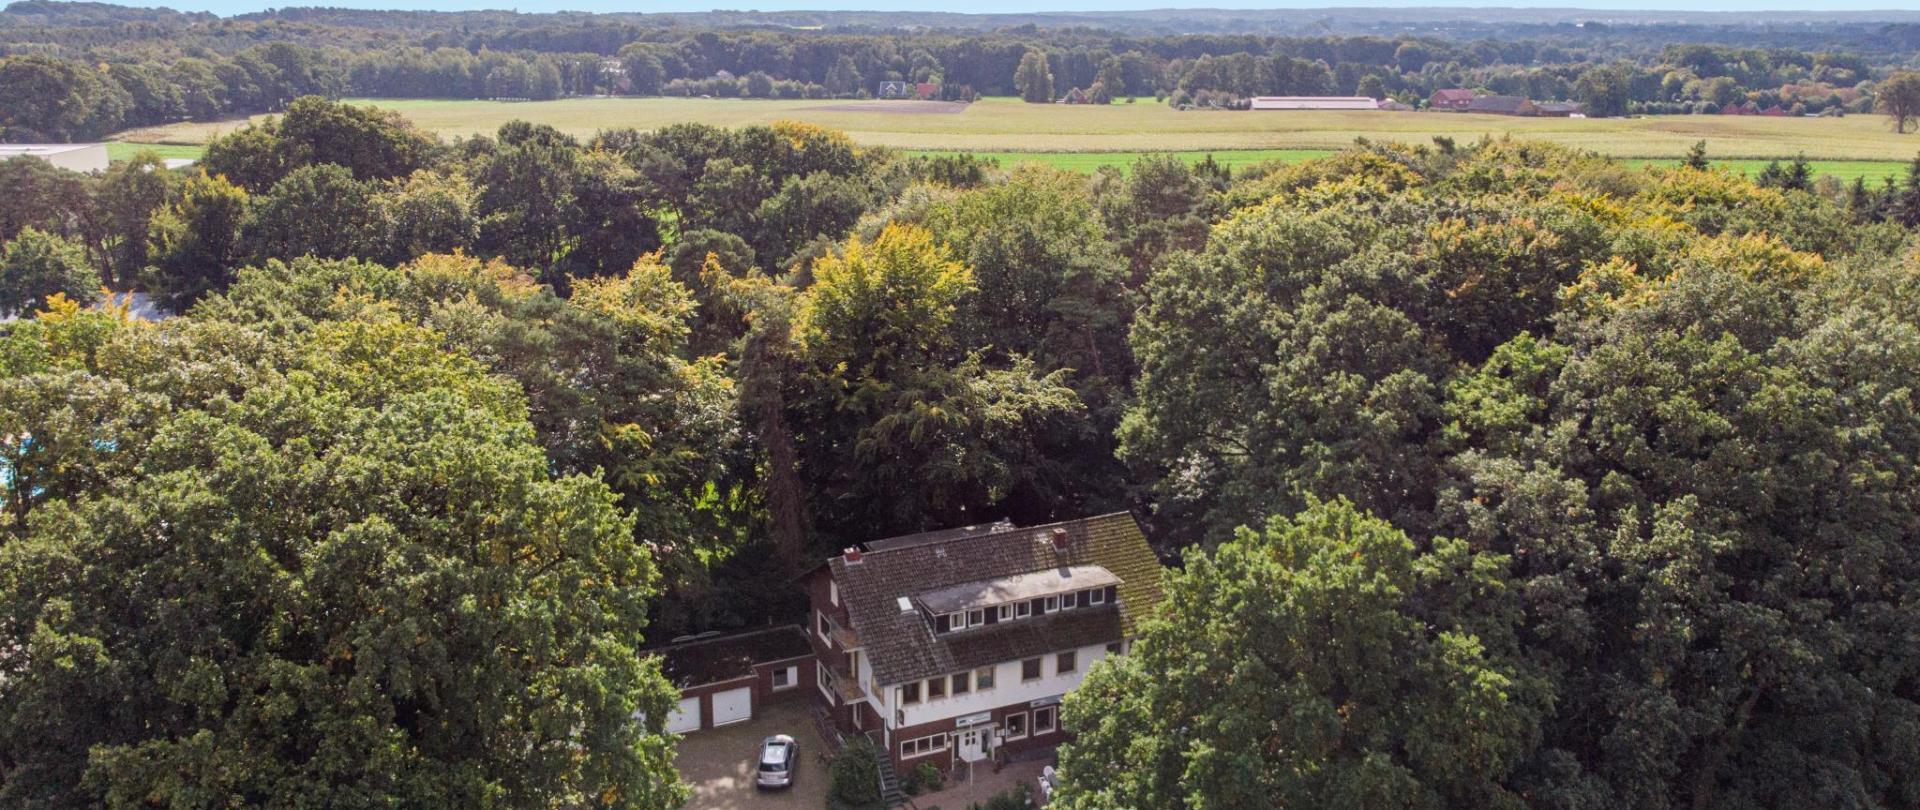 hopenerwald-31.jpg